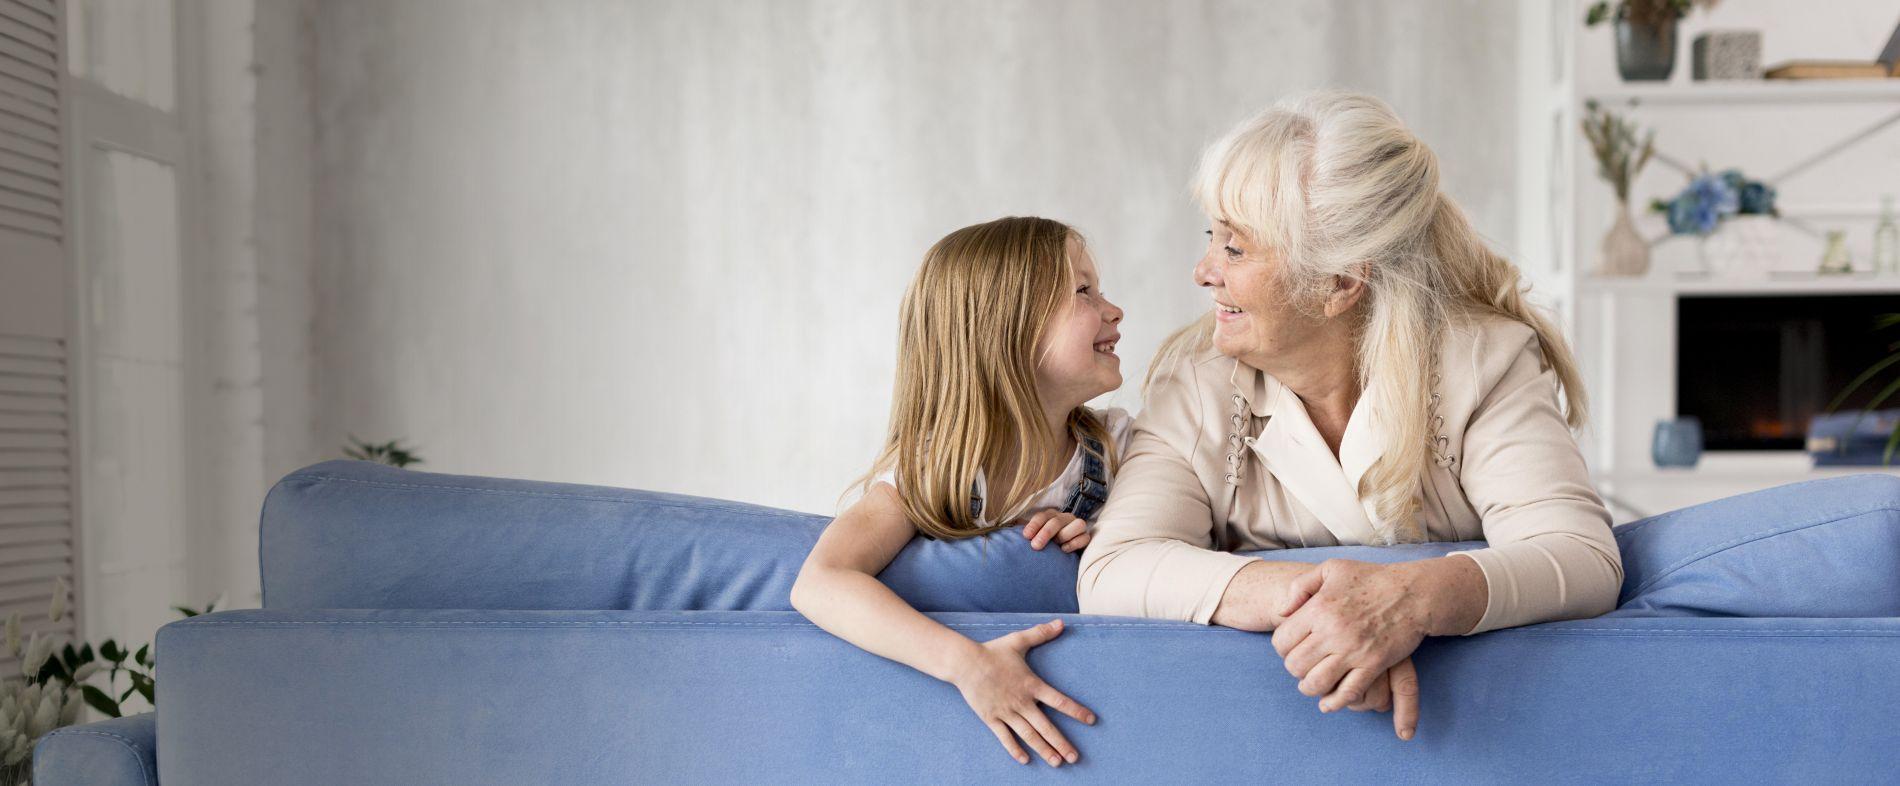 Кредит пенсионерам без отказа, без истории и справок